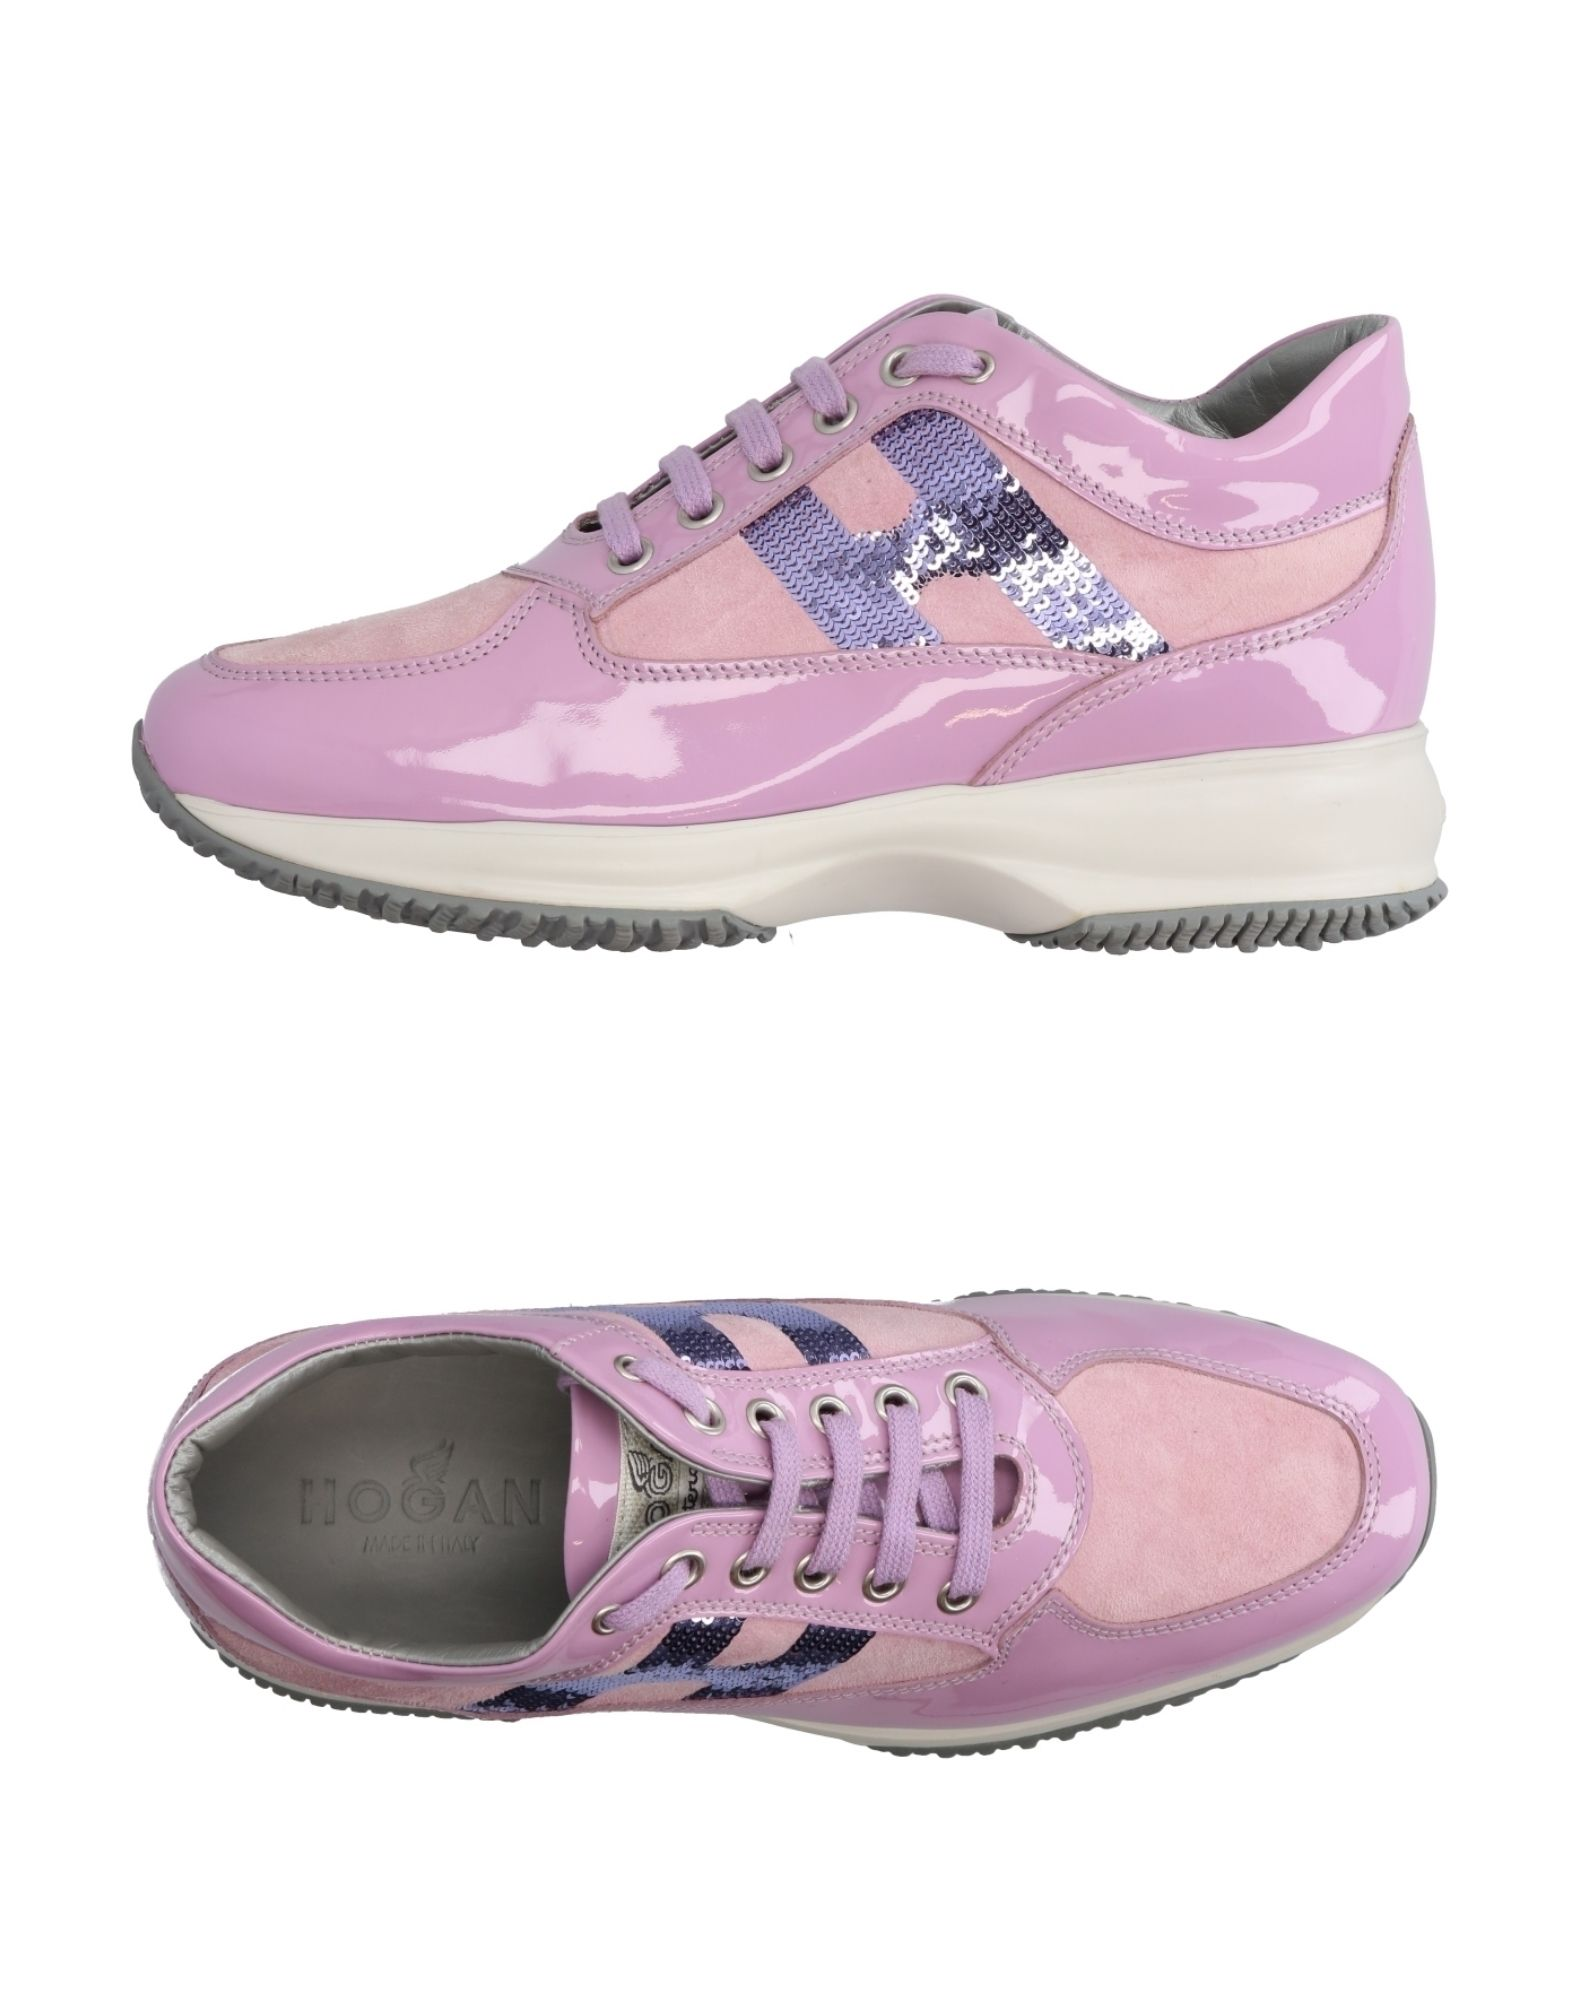 Hogan Sneakers Damen  11292463LEGut aussehende strapazierfähige Schuhe